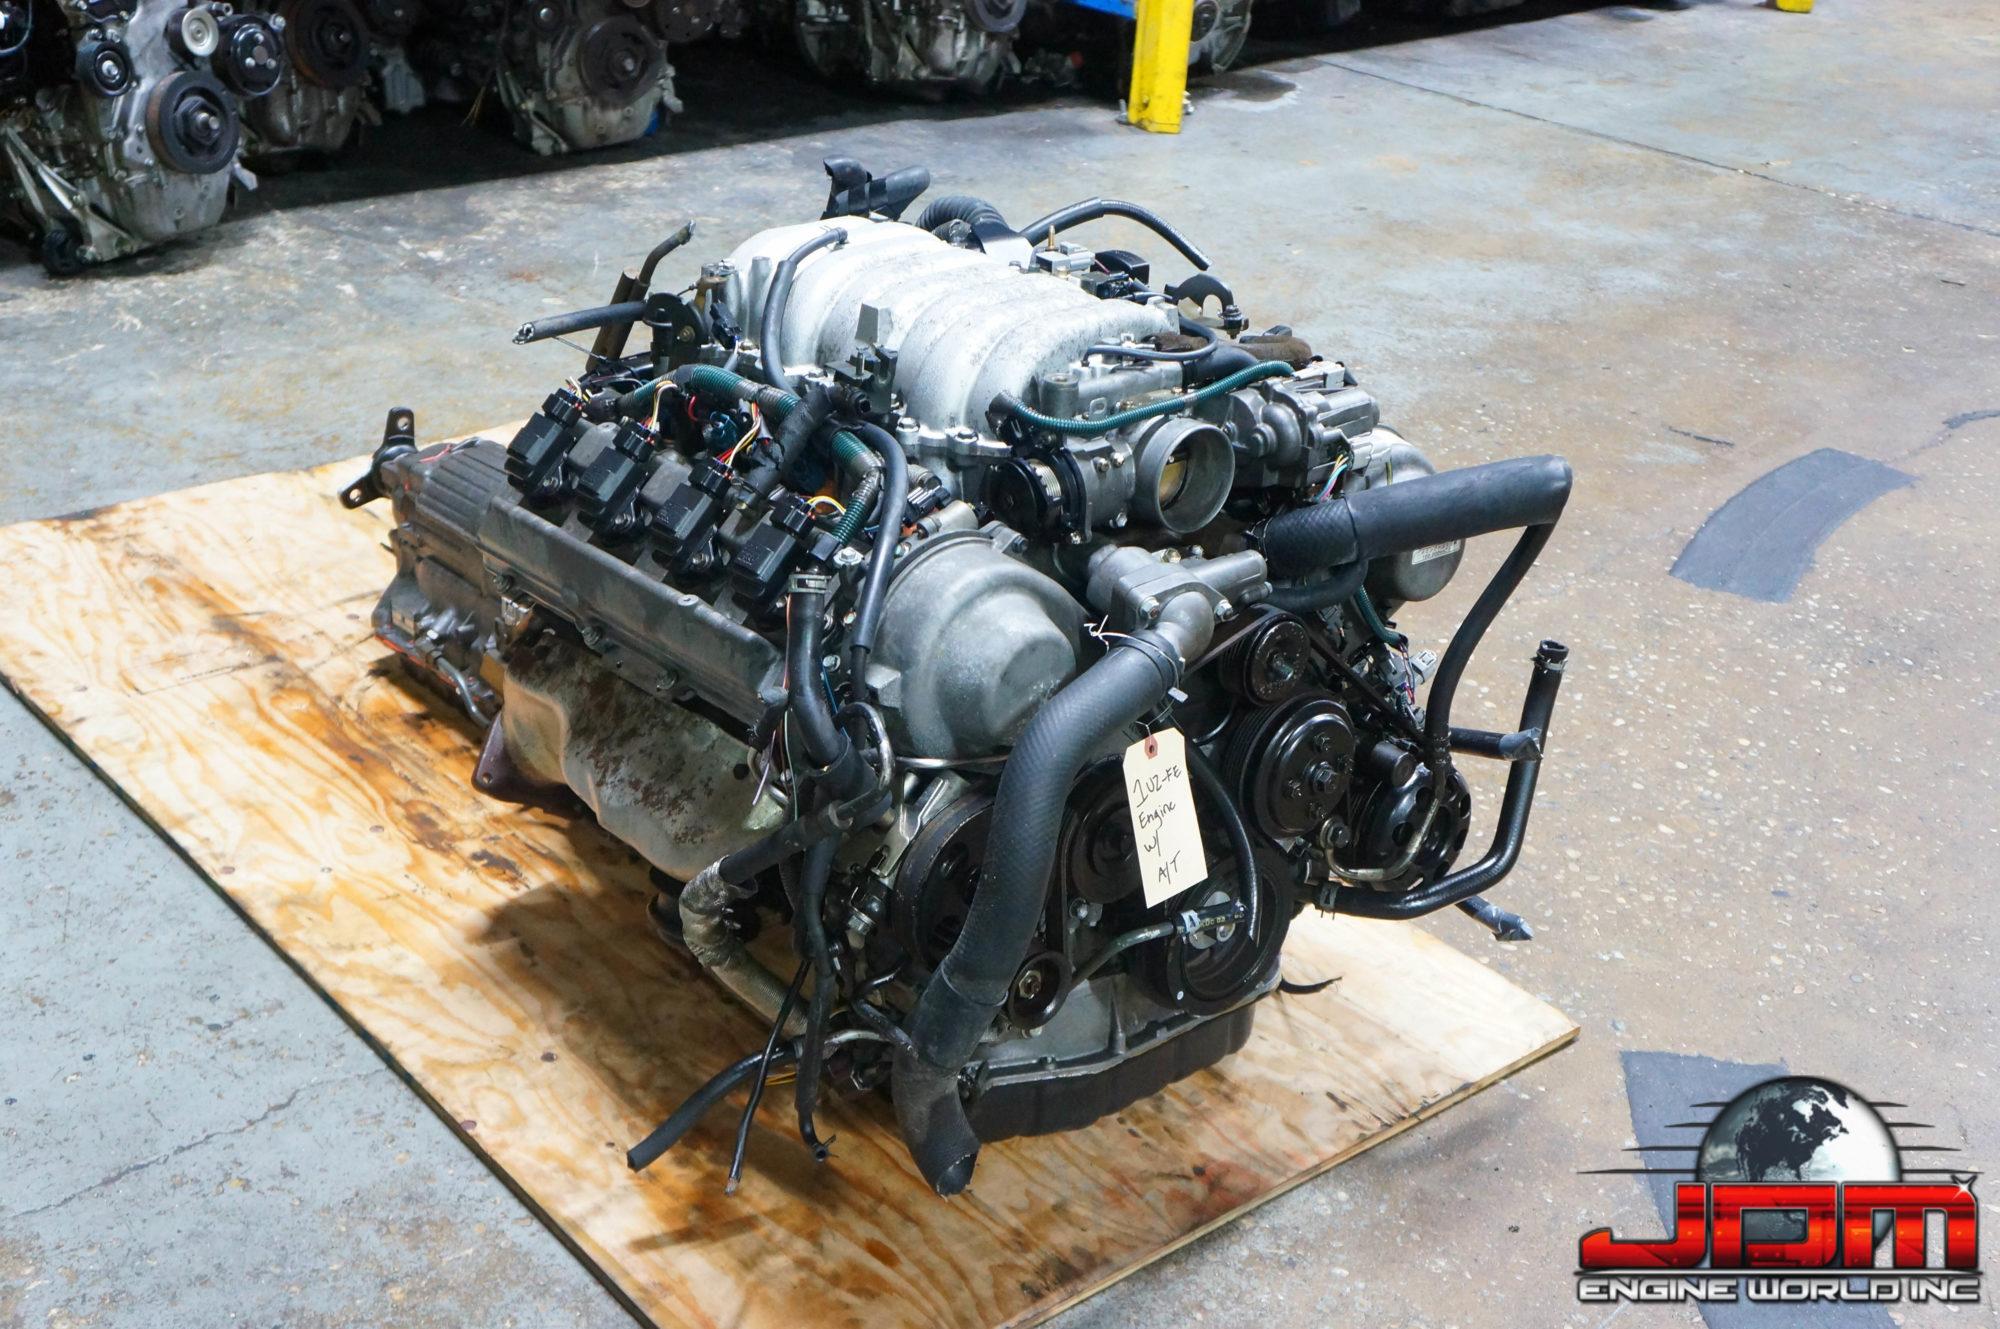 JDM 1UZ-FE GS400 SC498-05 LEXUS 00 LS400 1UZ-FE ENGINE & AUTOMATIC TRANSMISSION 4.0L VVTi